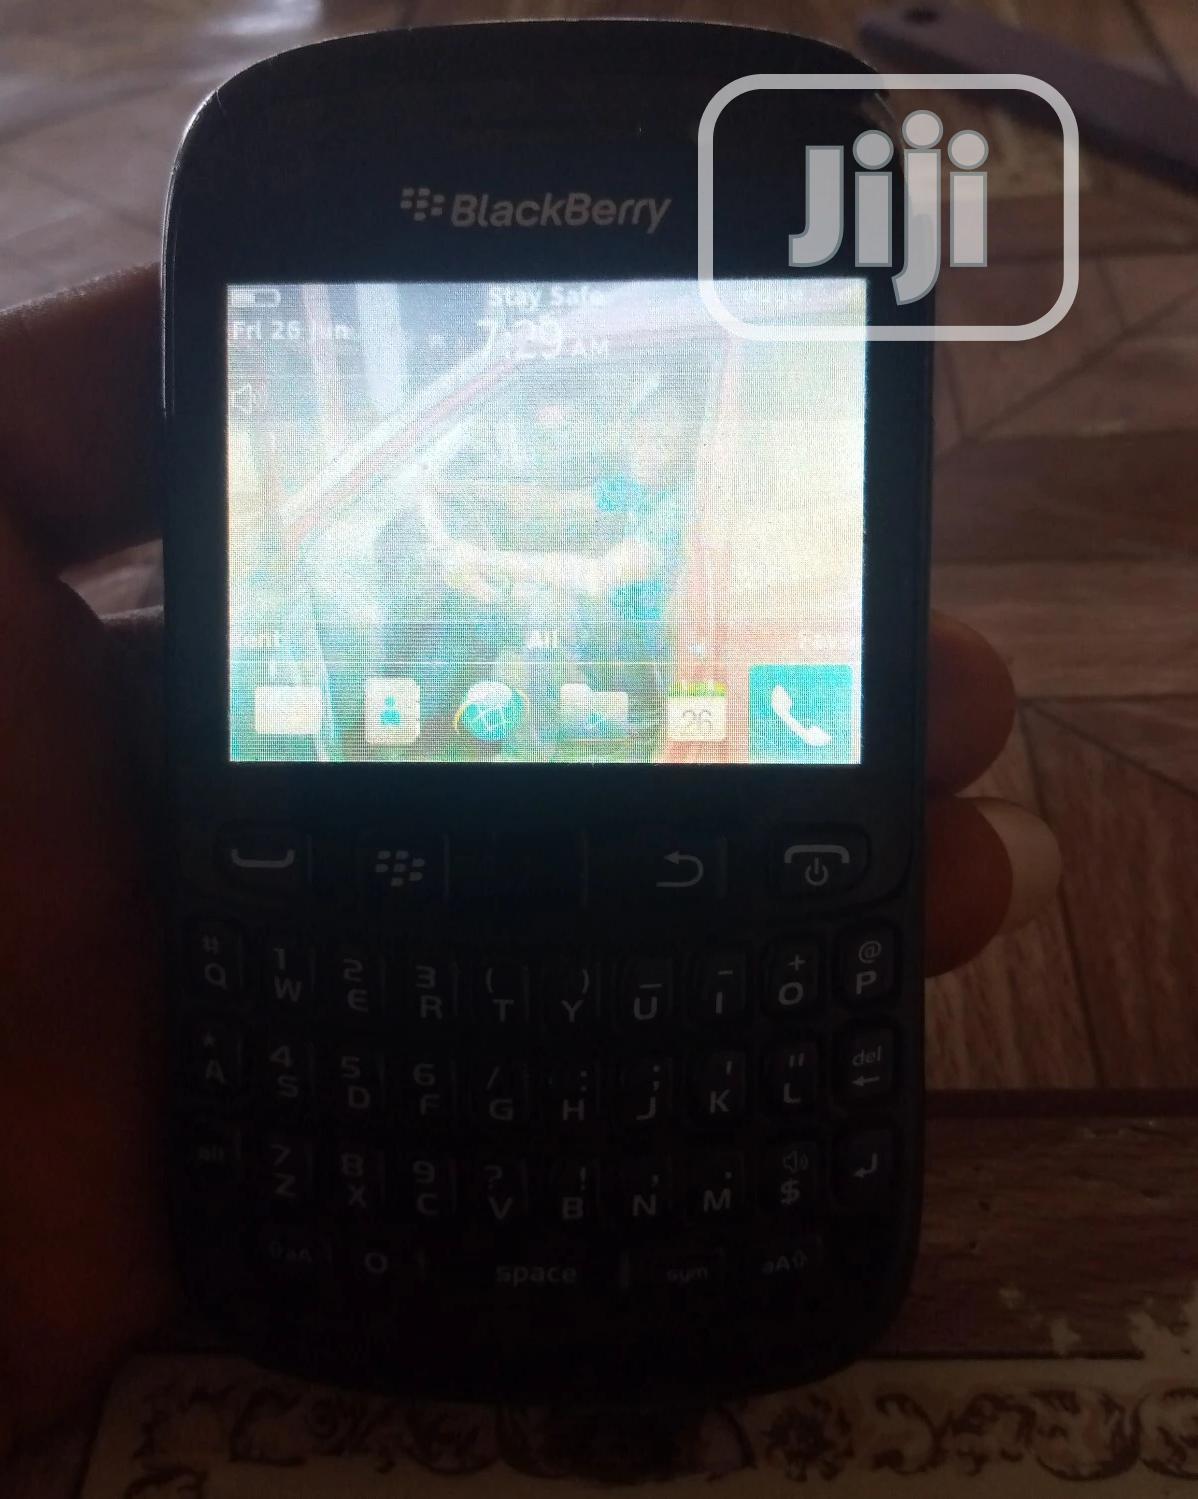 BlackBerry Curve 9220 Black